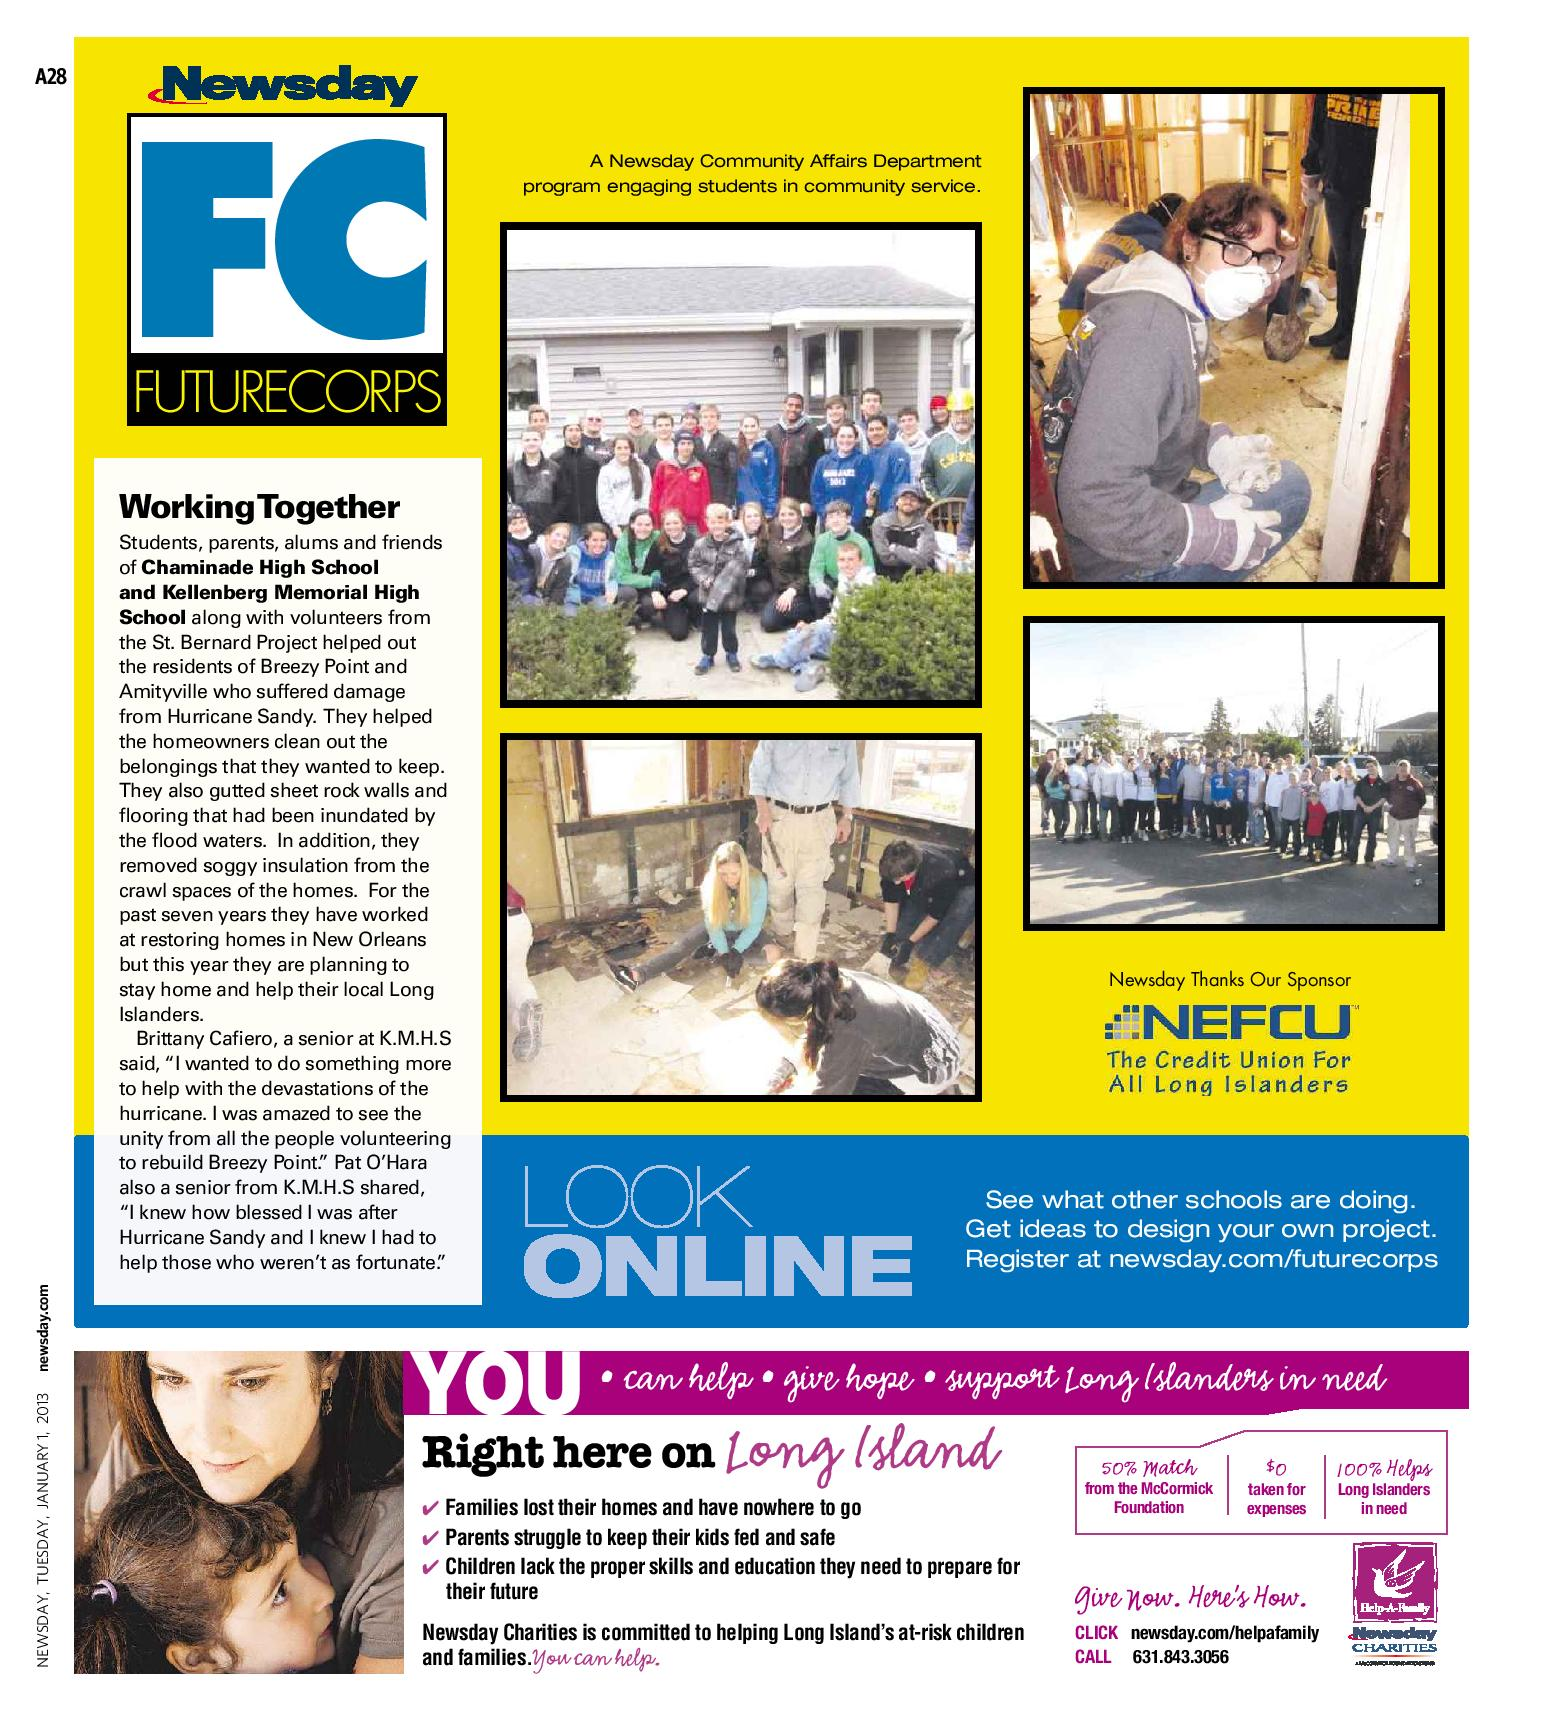 Newsday FutureCorps 2013